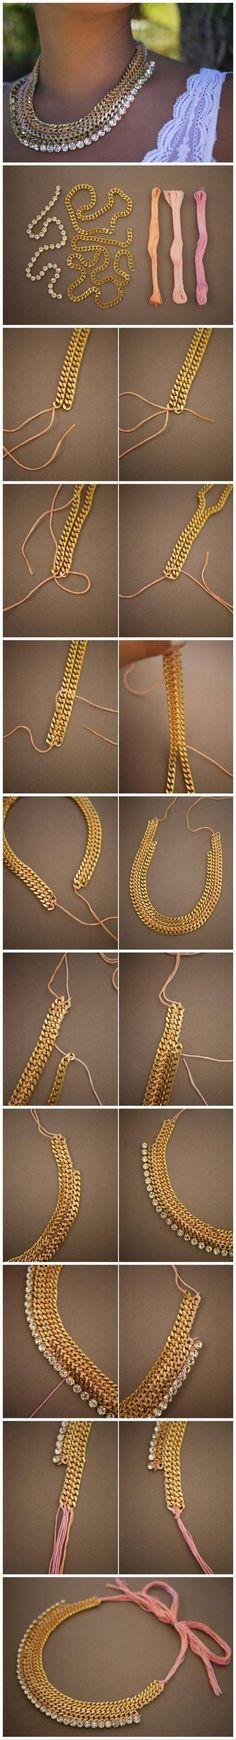 10 Amazing DIY Necklaces Tutorials   Planet of Women- Health, Fashion & Beauty